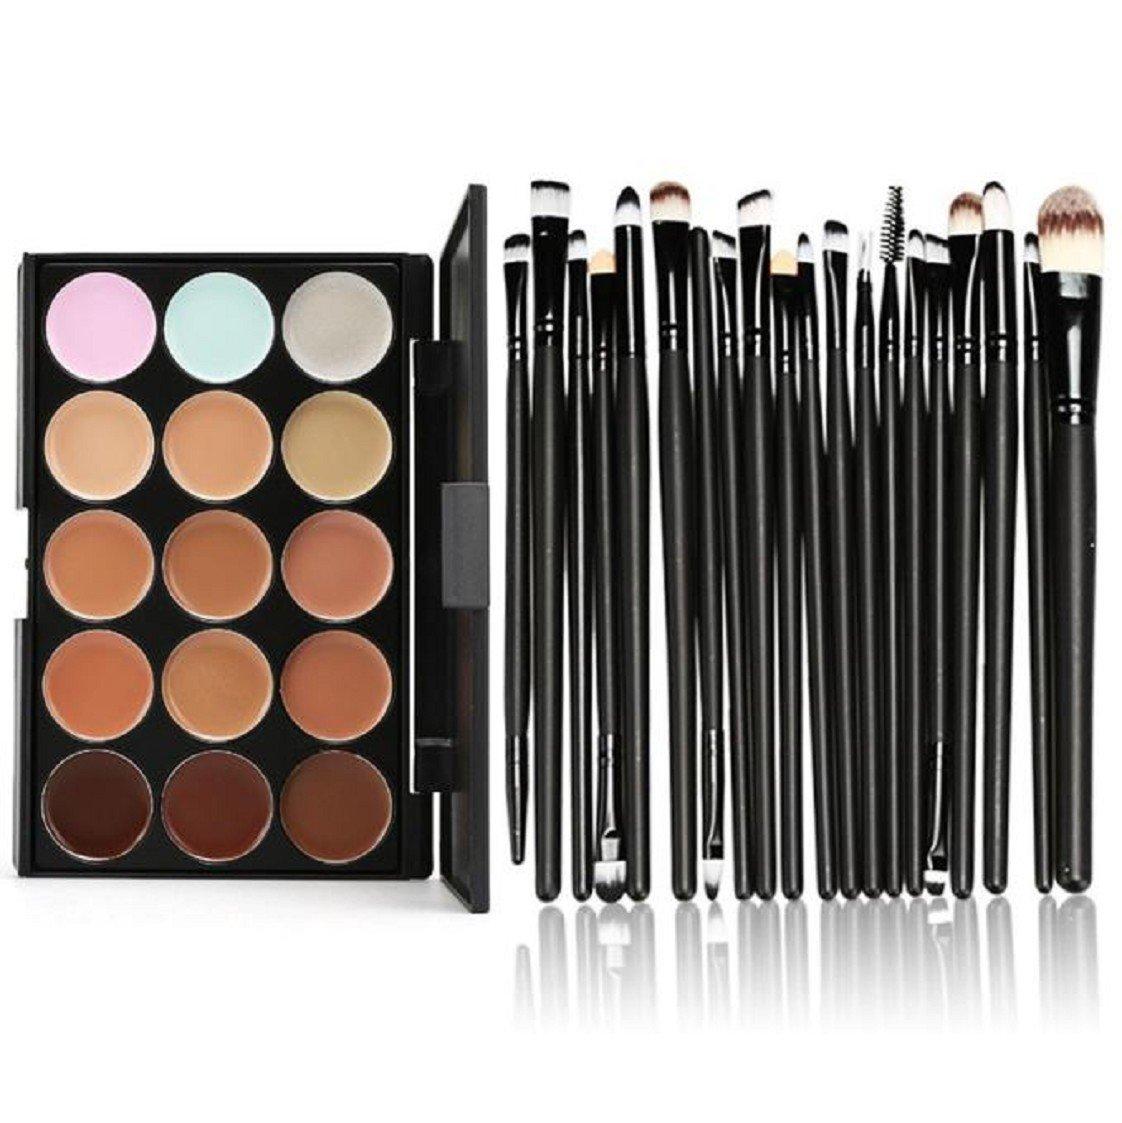 Vovotrade 15 Farben-Form-Gesichts-Creme Make-up Concealer Palette Professional + 20 Pinsel_Schwarz Vovotrade®